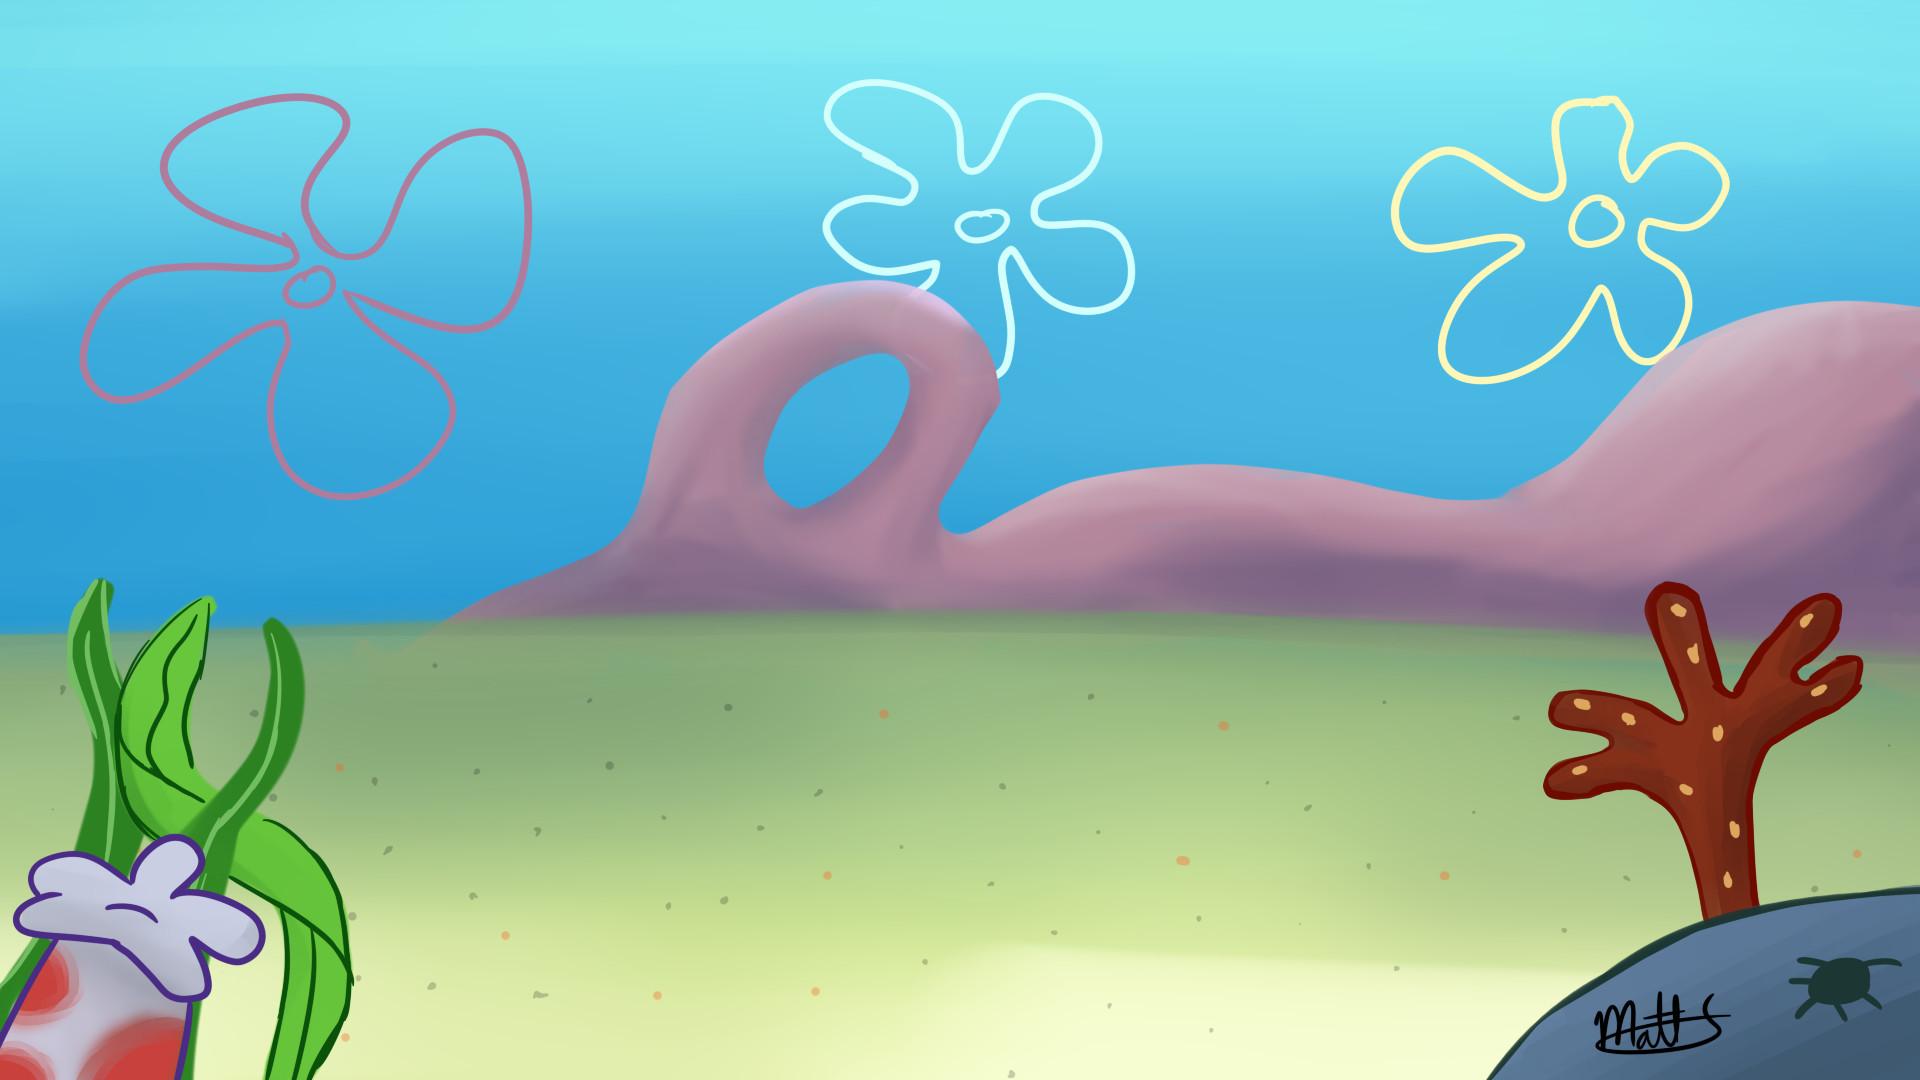 Res: 1920x1080, Funny Spongebob Wallpapers